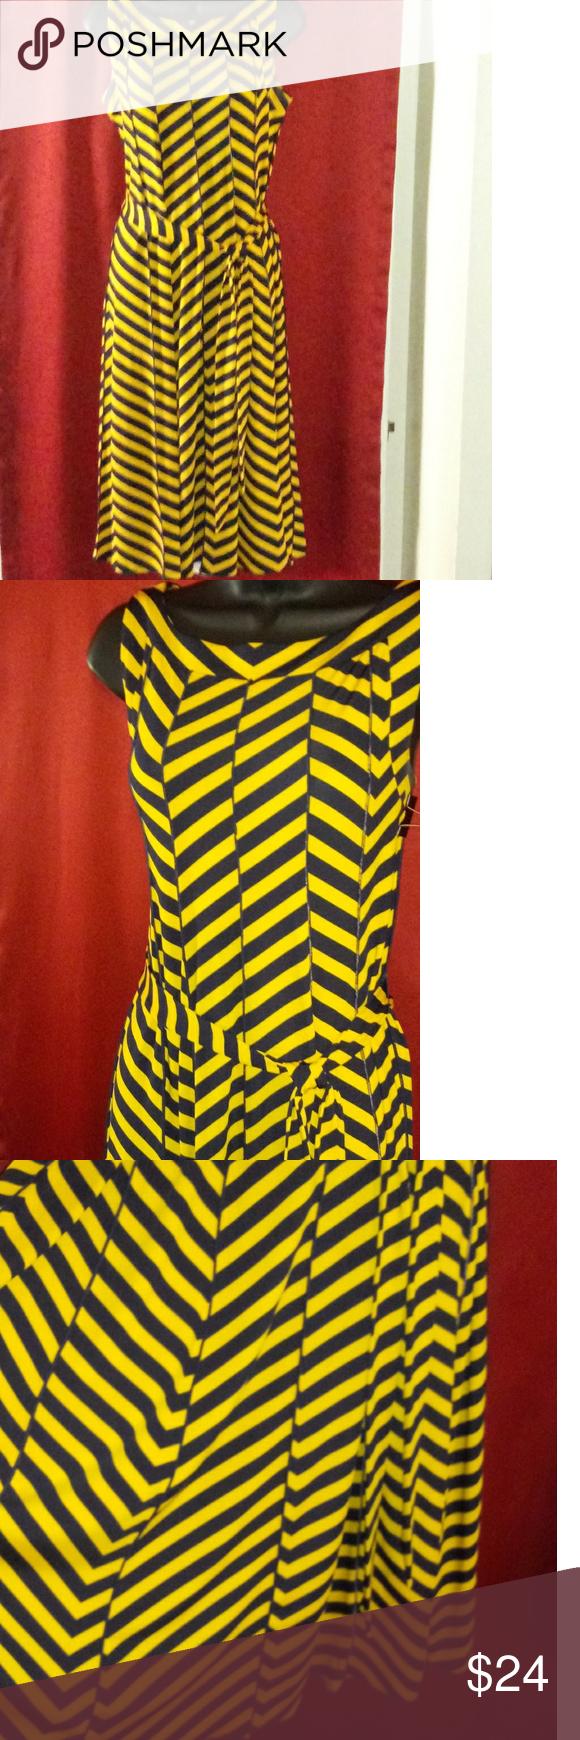 I Le New York Yellow Dress Womens Yellow Dress Yellow Dress Dresses [ 1740 x 580 Pixel ]